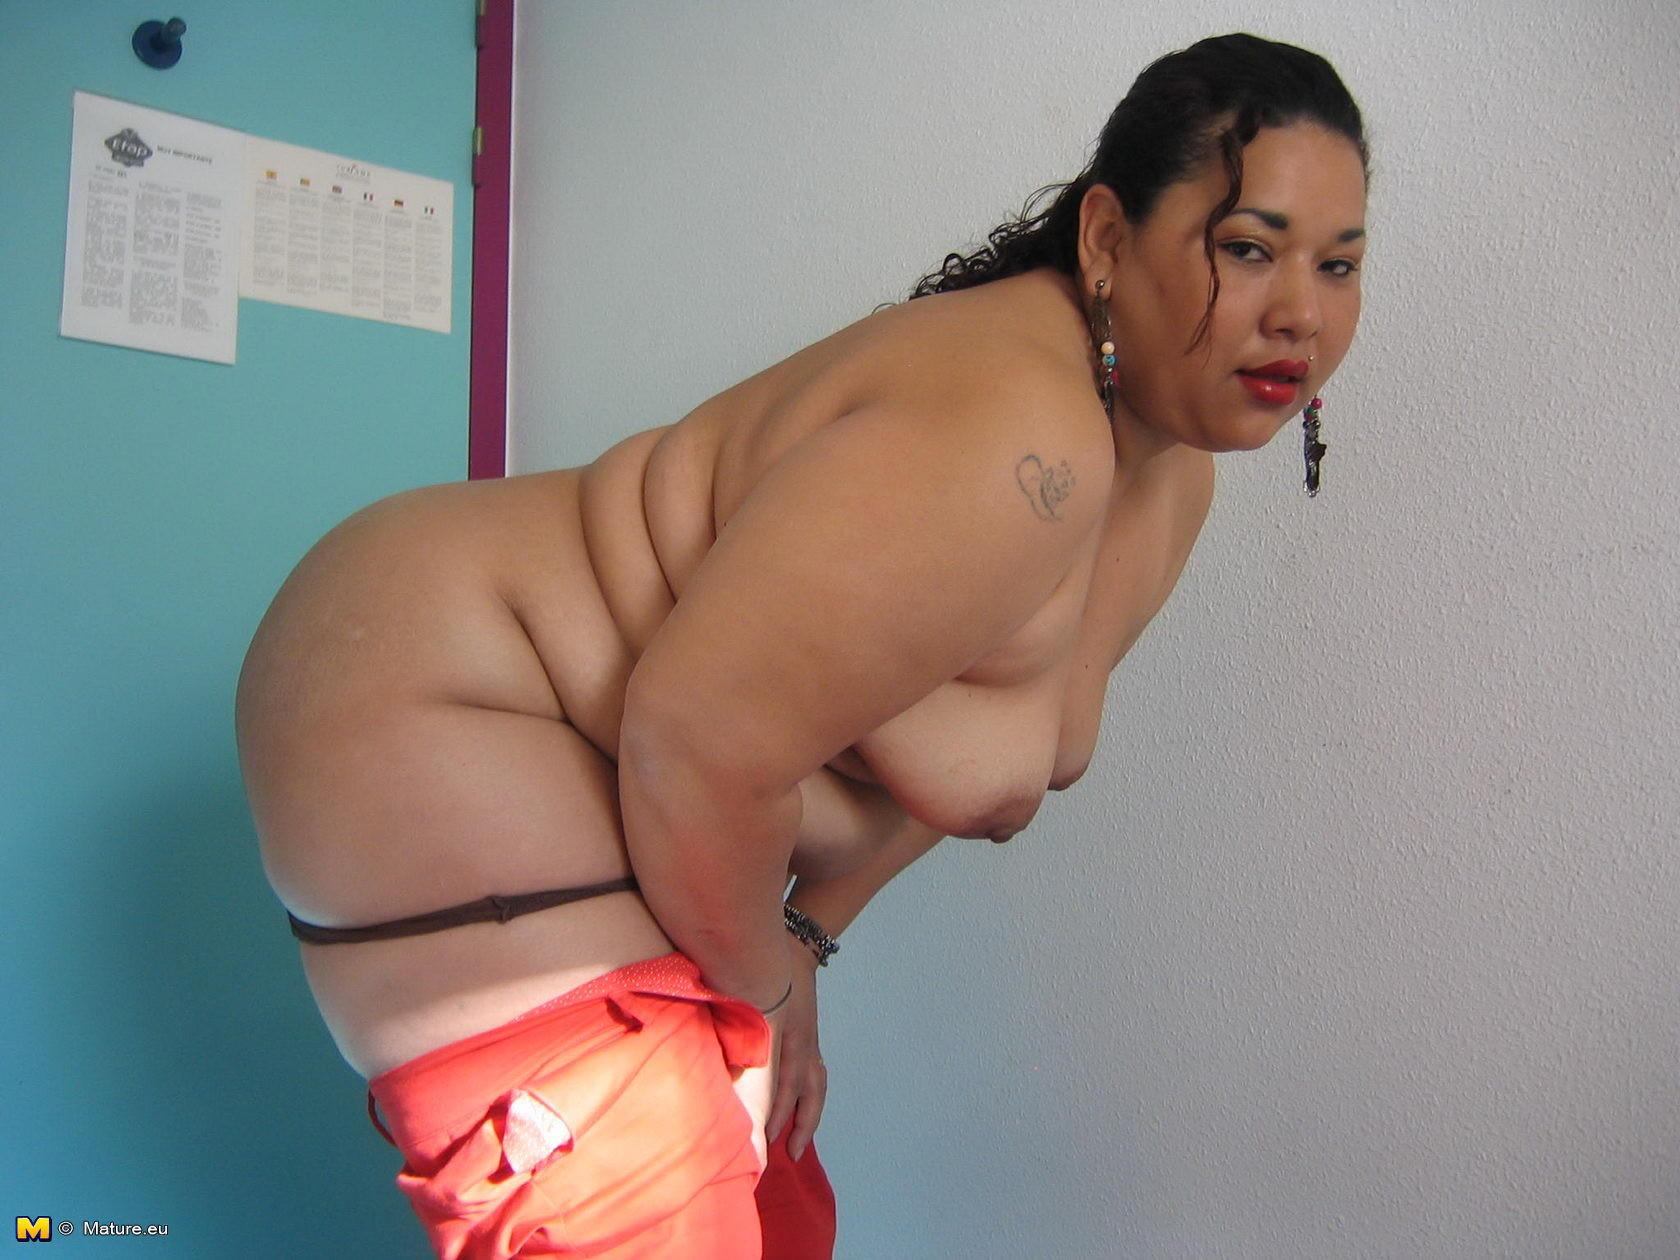 amateur chubby asian matures naked pics